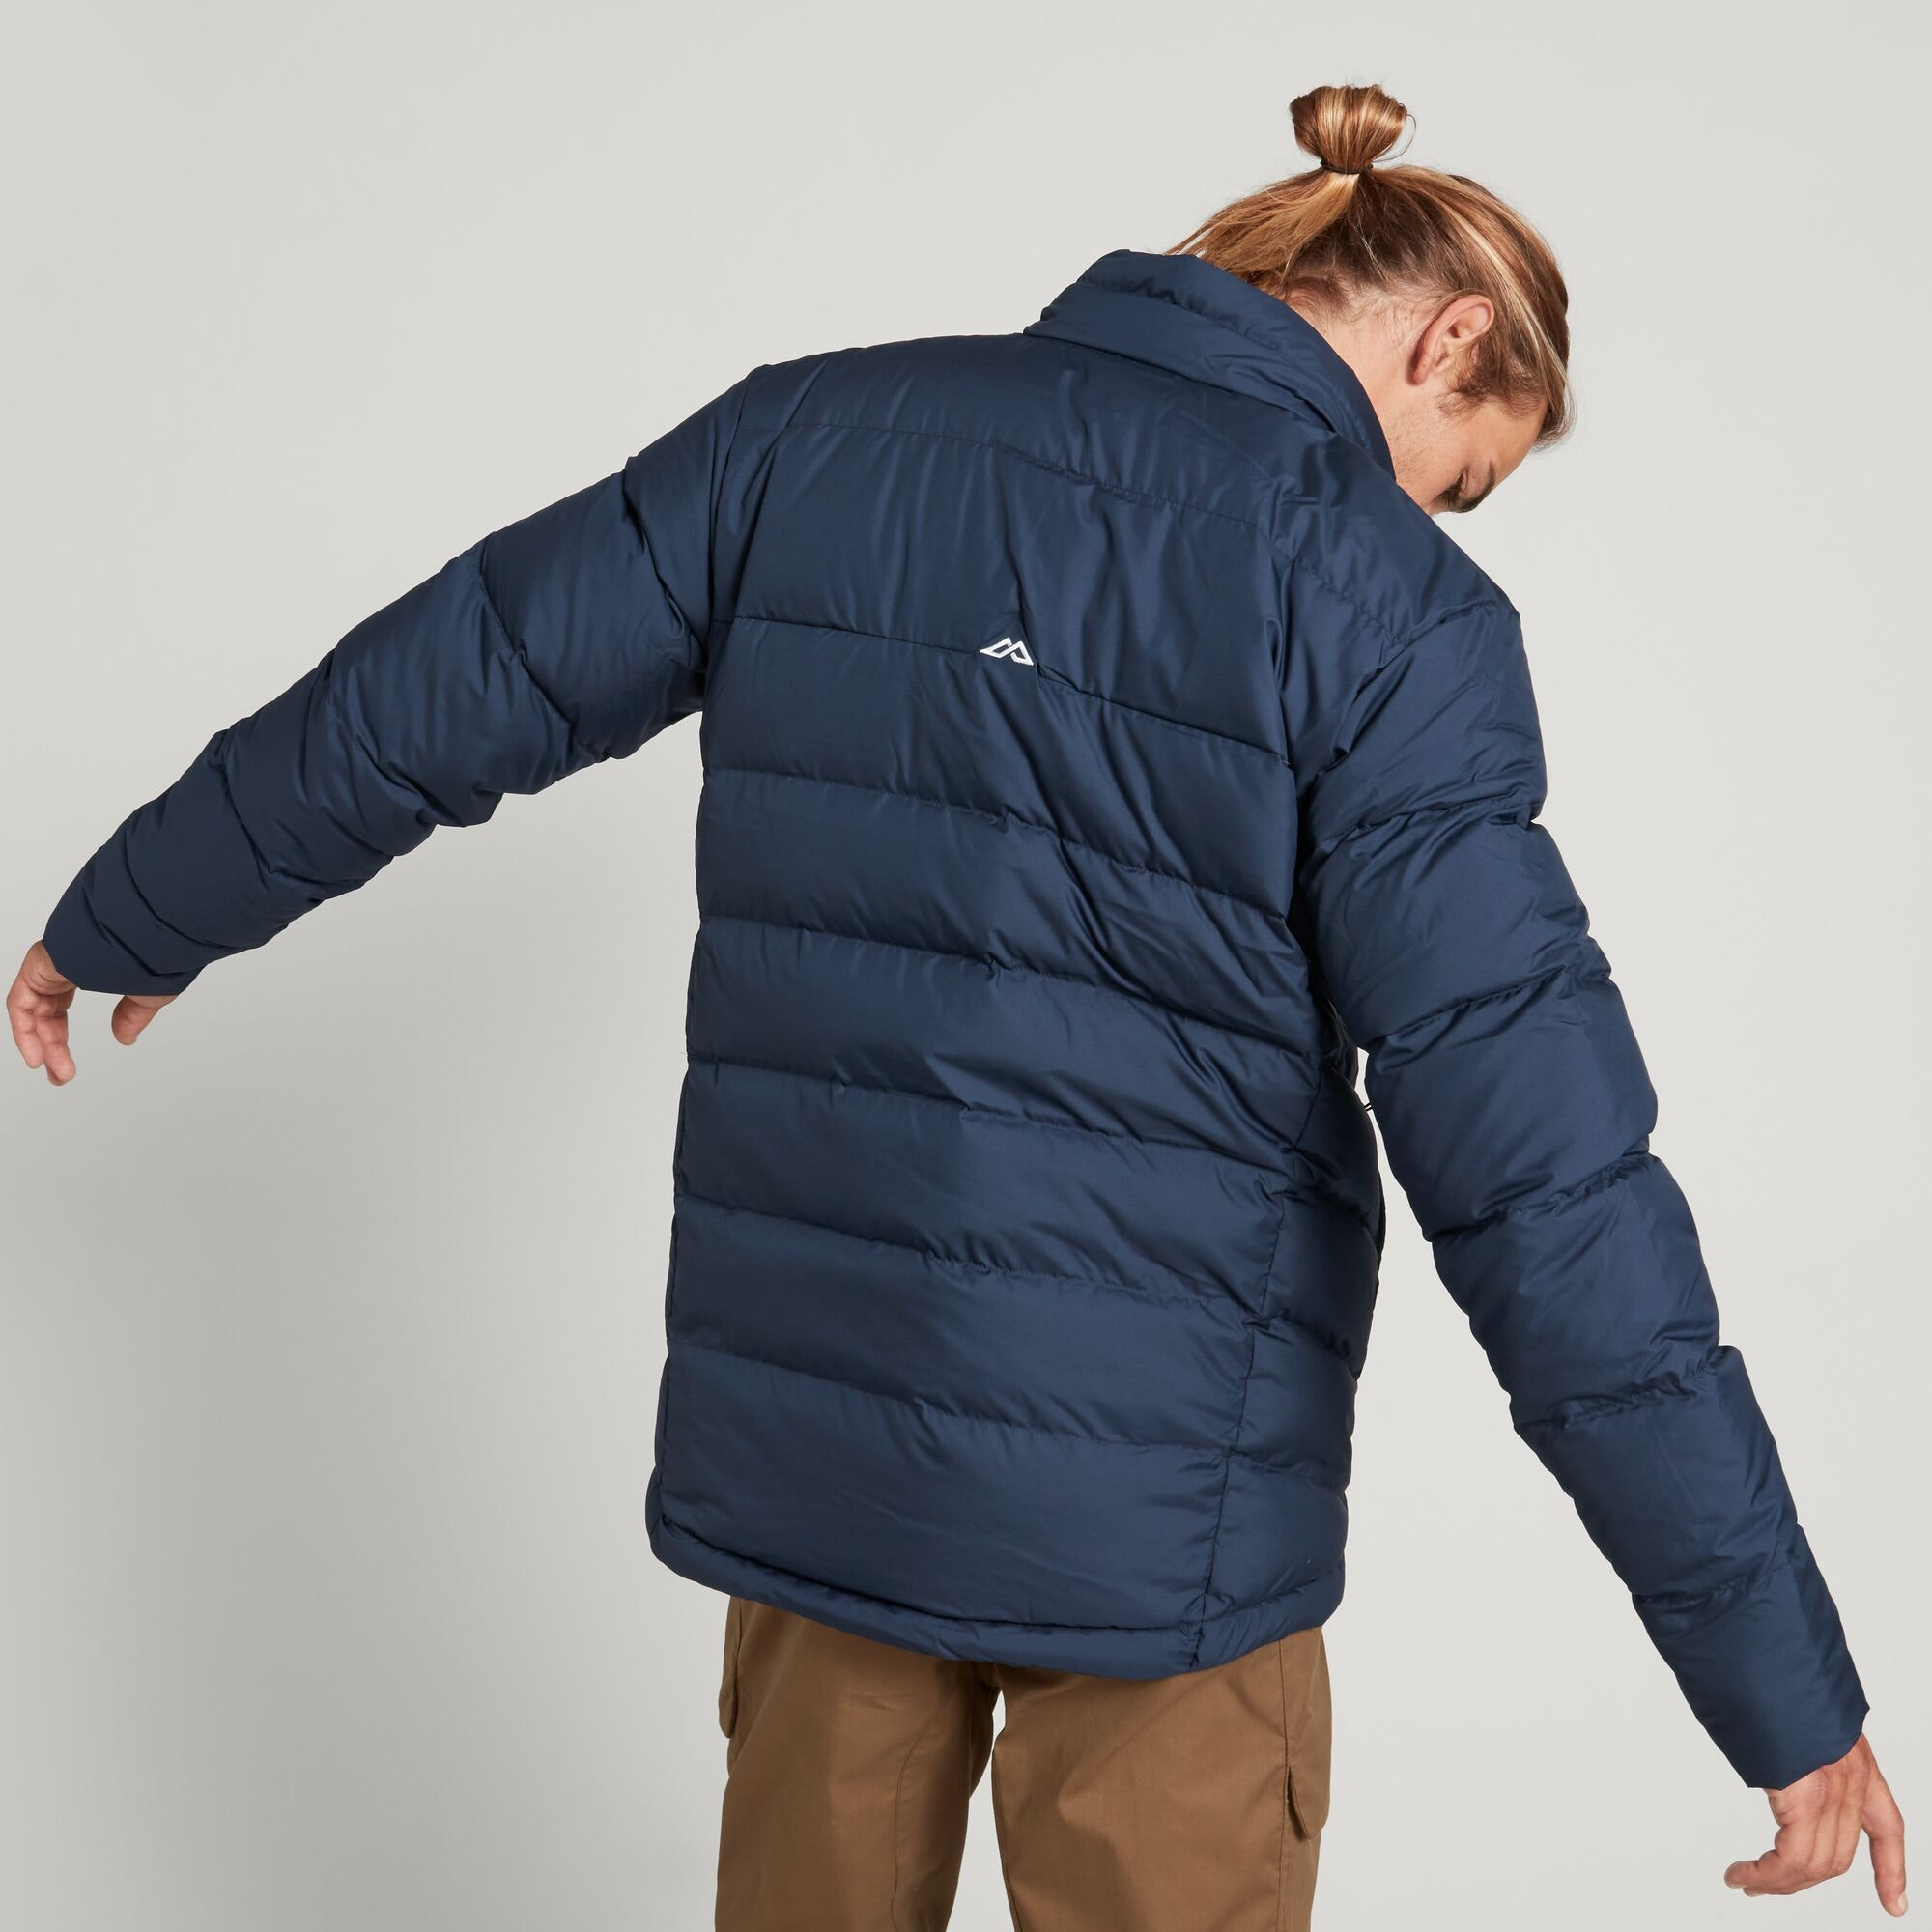 thumbnail 19 - NEW Kathmandu Epiq Mens 600 Fill Down Puffer Warm Outdoor Winter Jacket